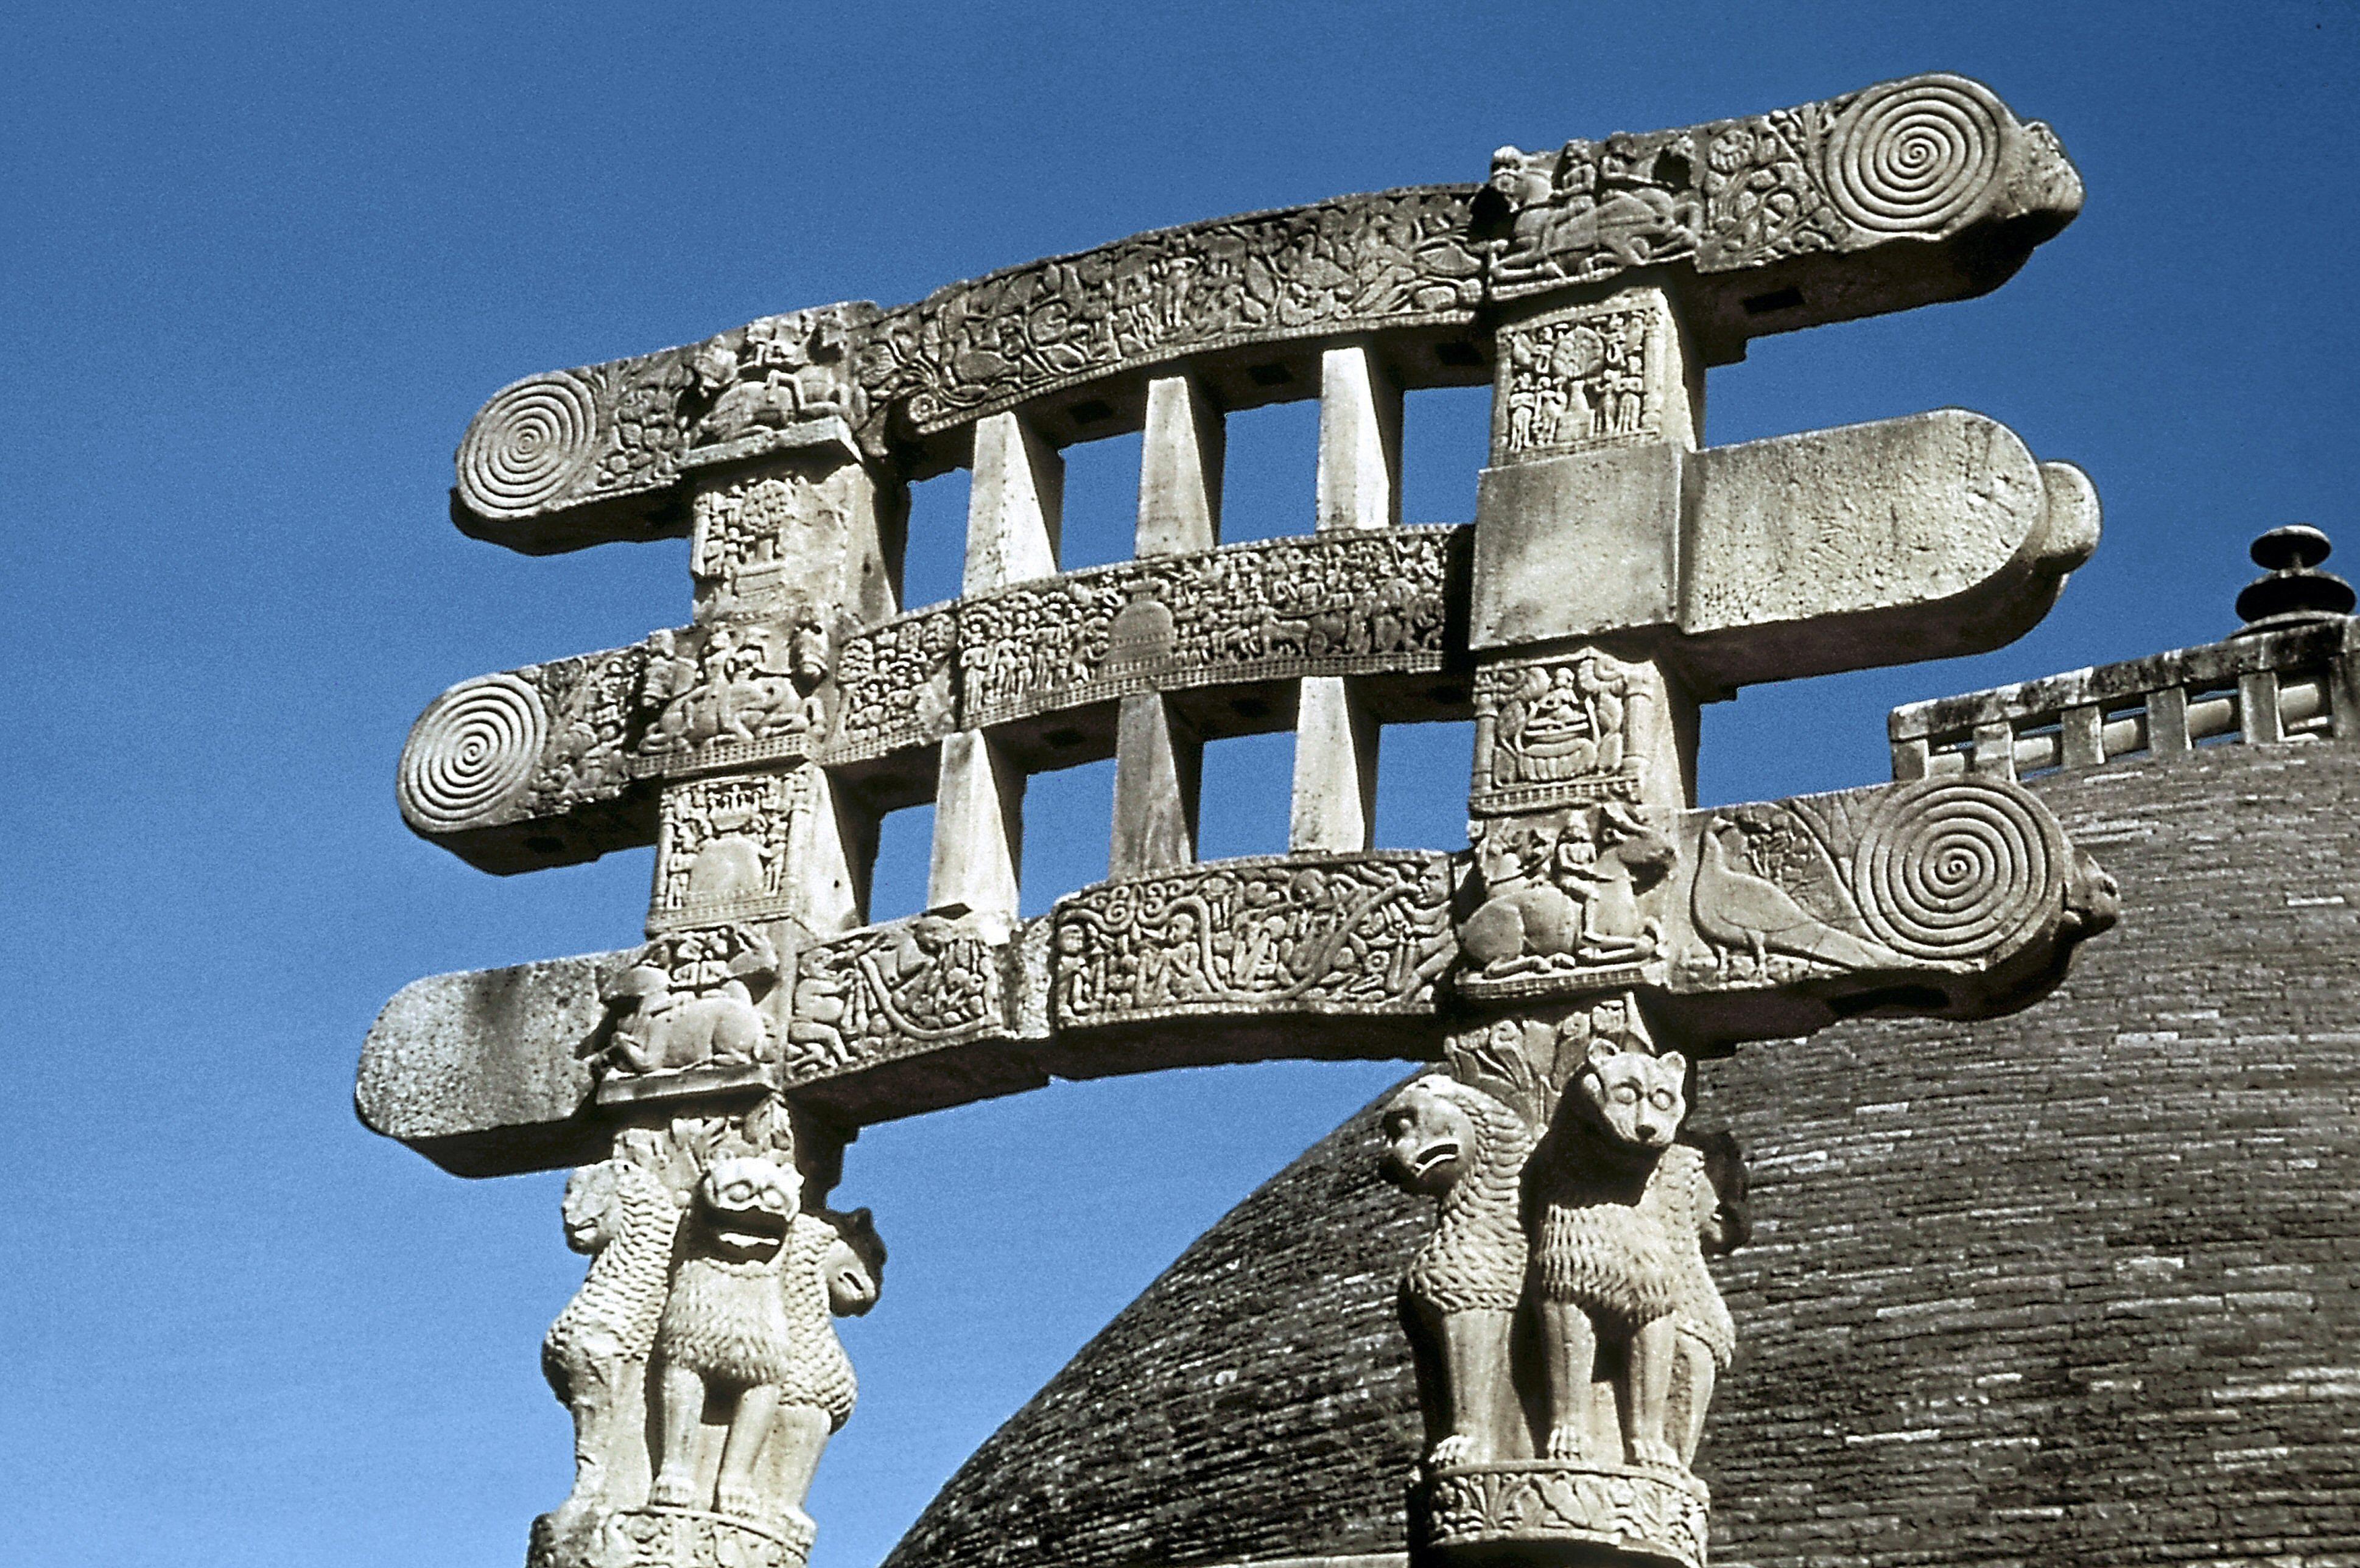 The Great Stupa, Sanchi, India, 75-50 BC